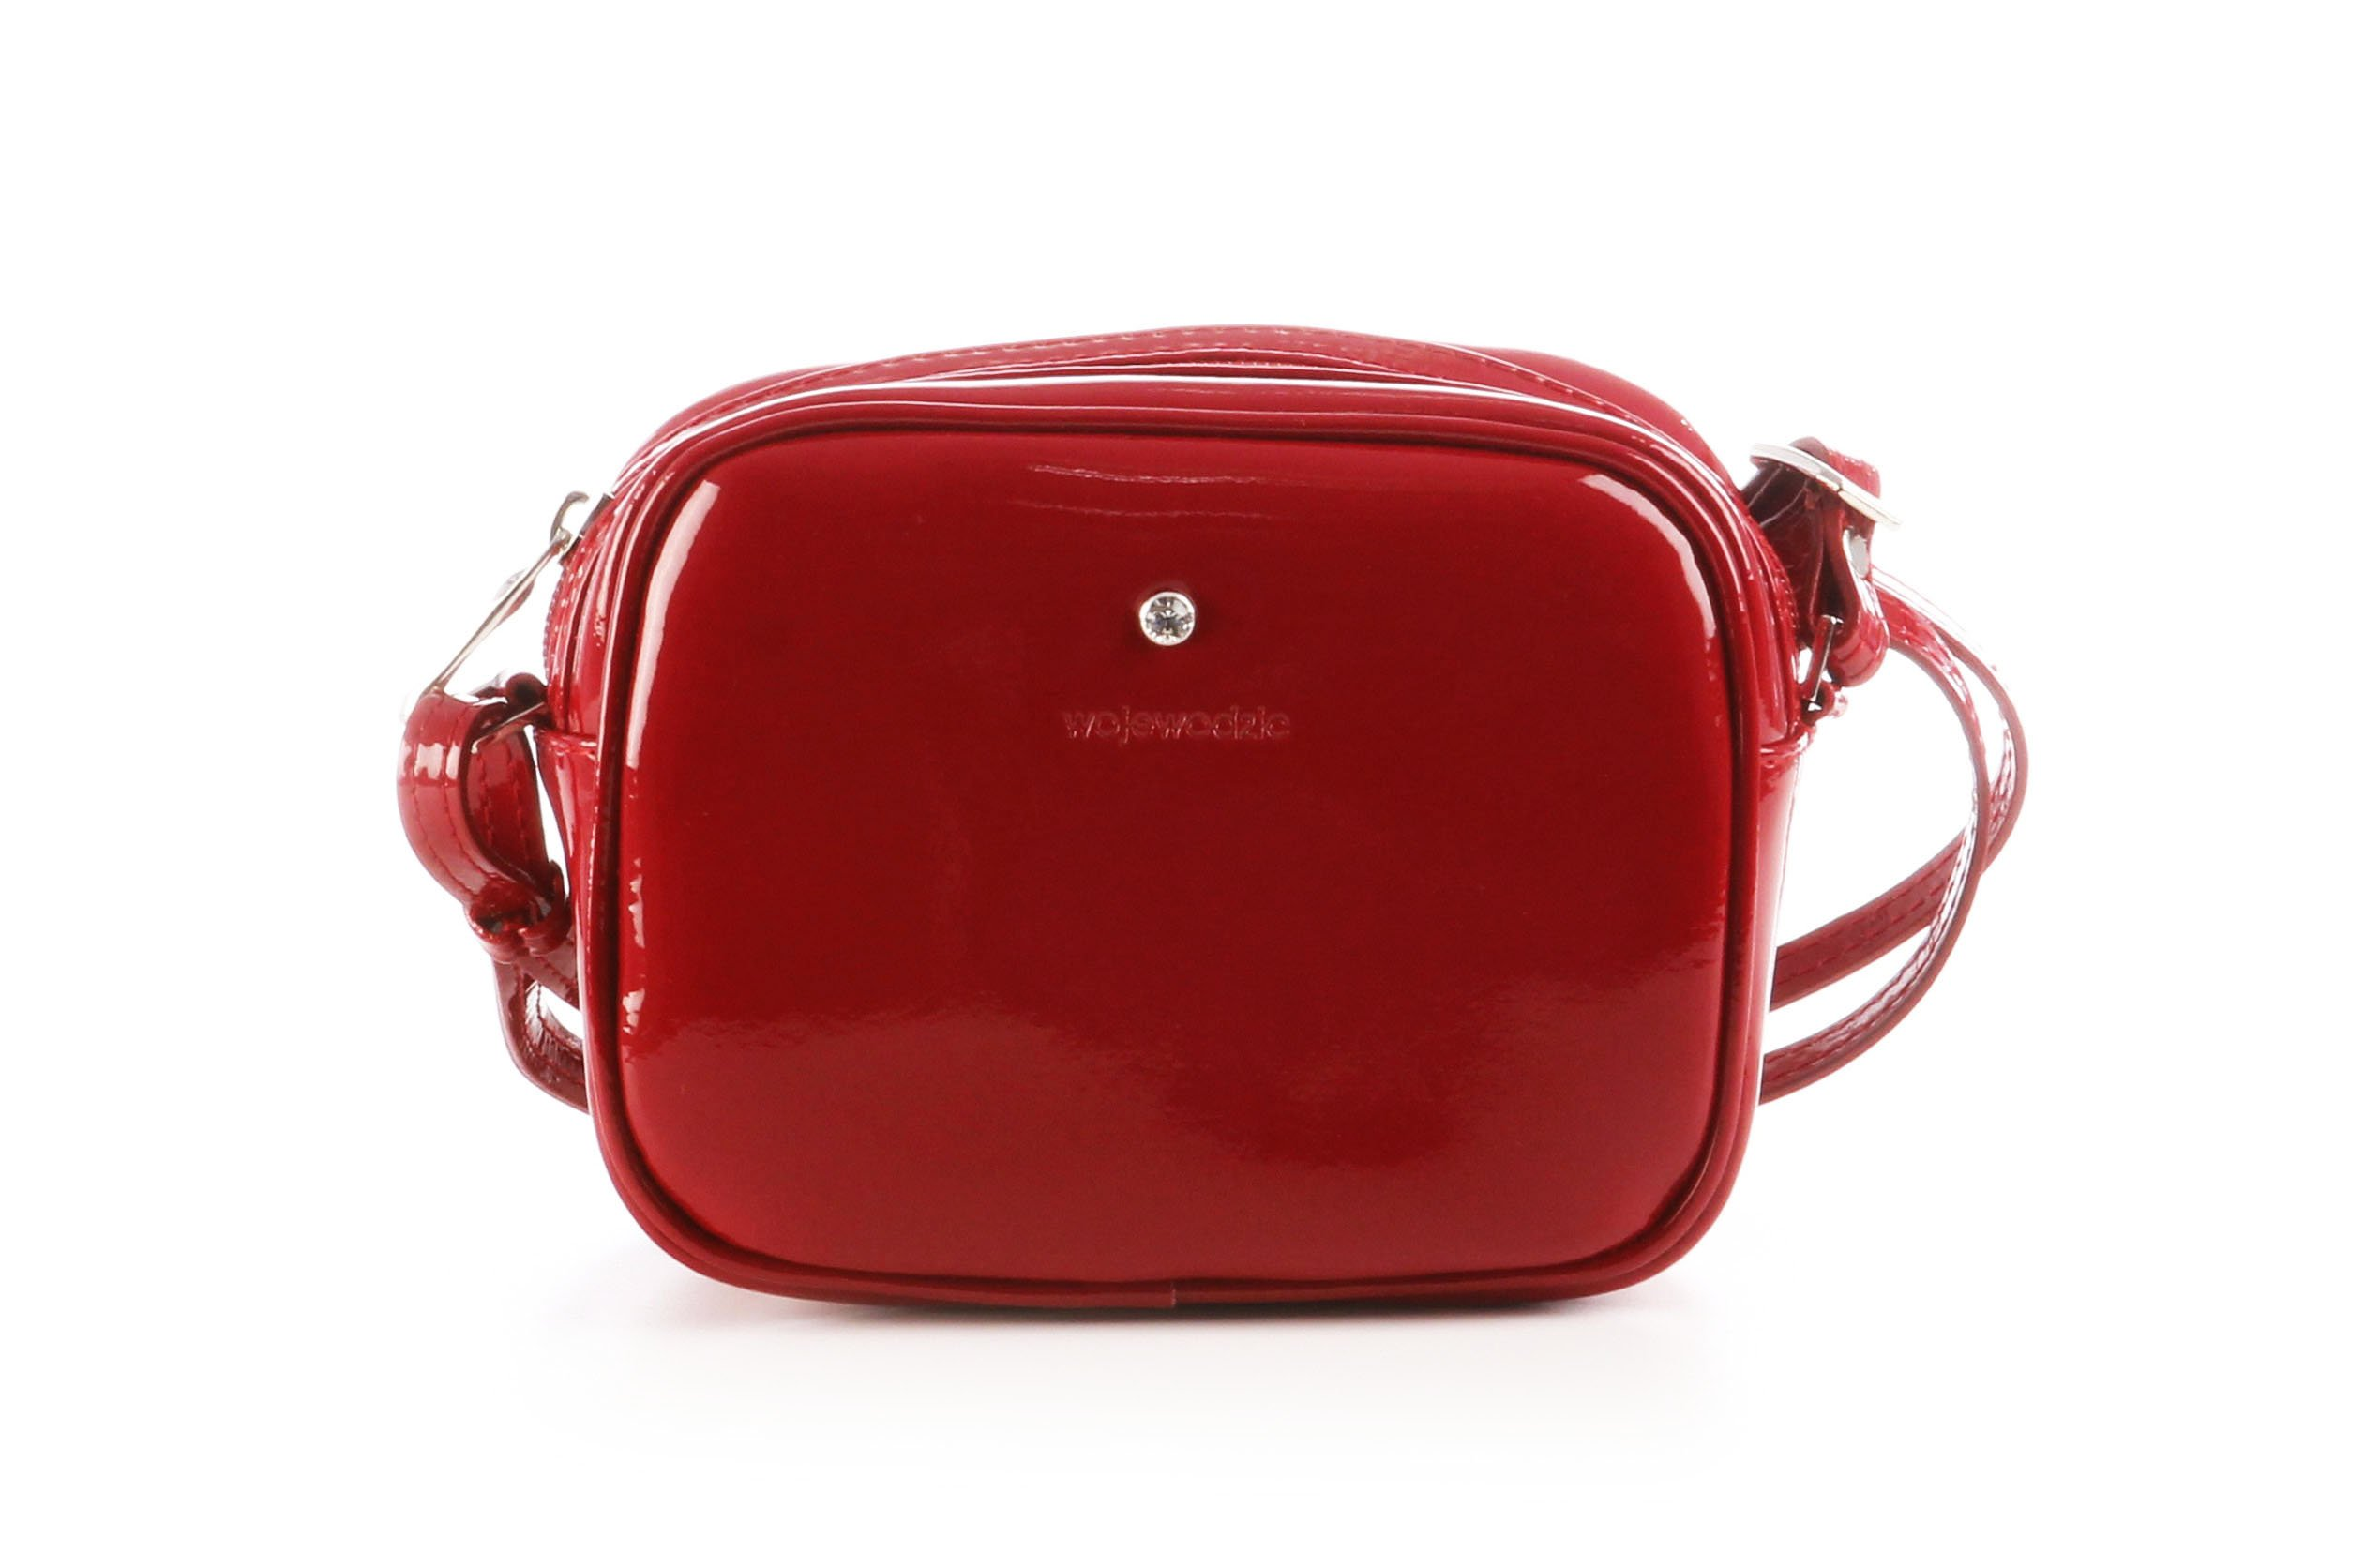 Kožená kabelka malá spoločenská lakovaná Wojewodzic červená 3GD28 PL02 75f490b4419